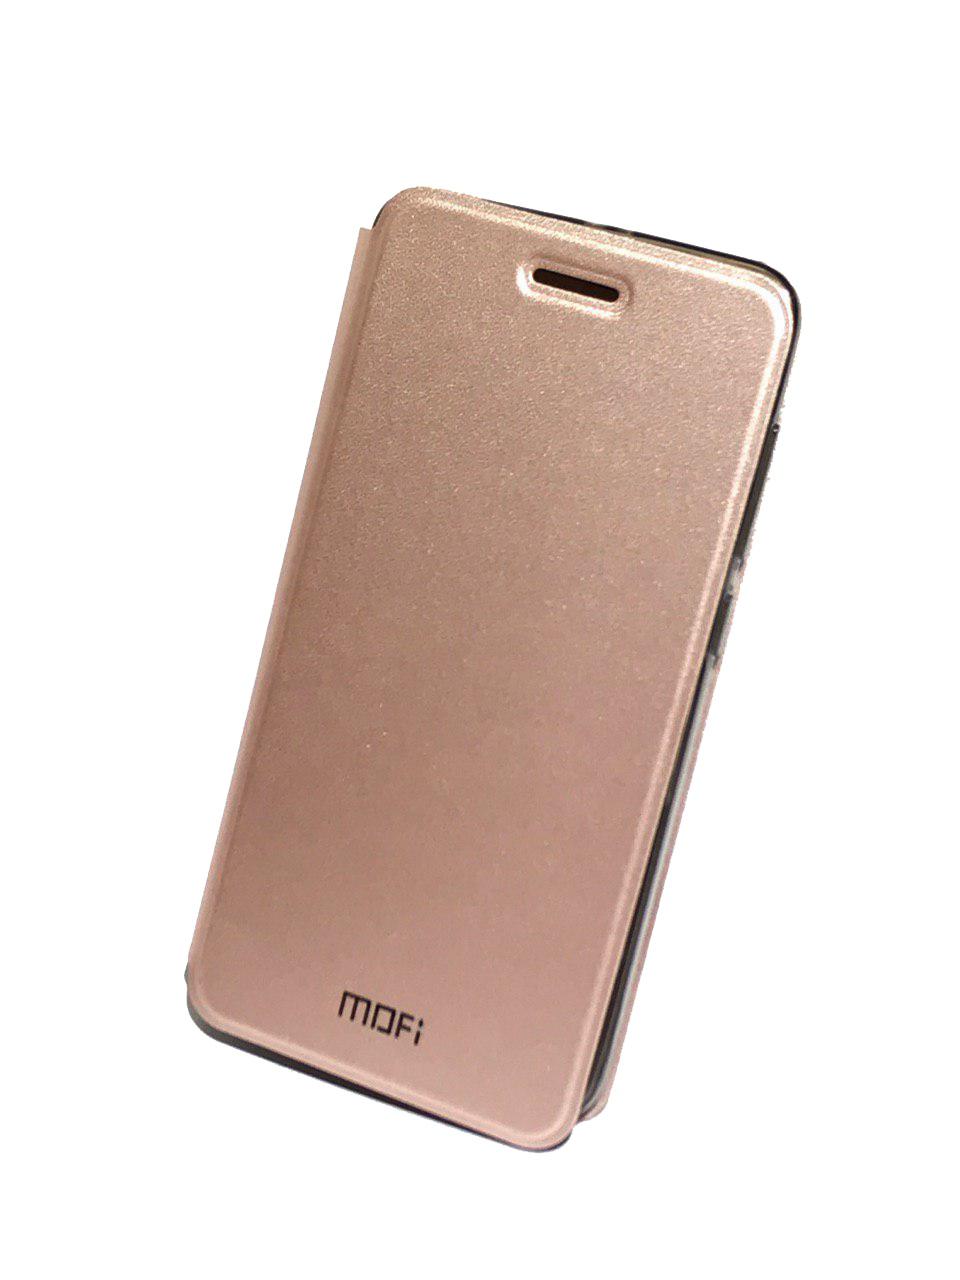 Чехол для сотового телефона Mofi Книжка Pearl Xiaomi Redmi 4X Rose Gold, розовый redmi 4x 16gb gold